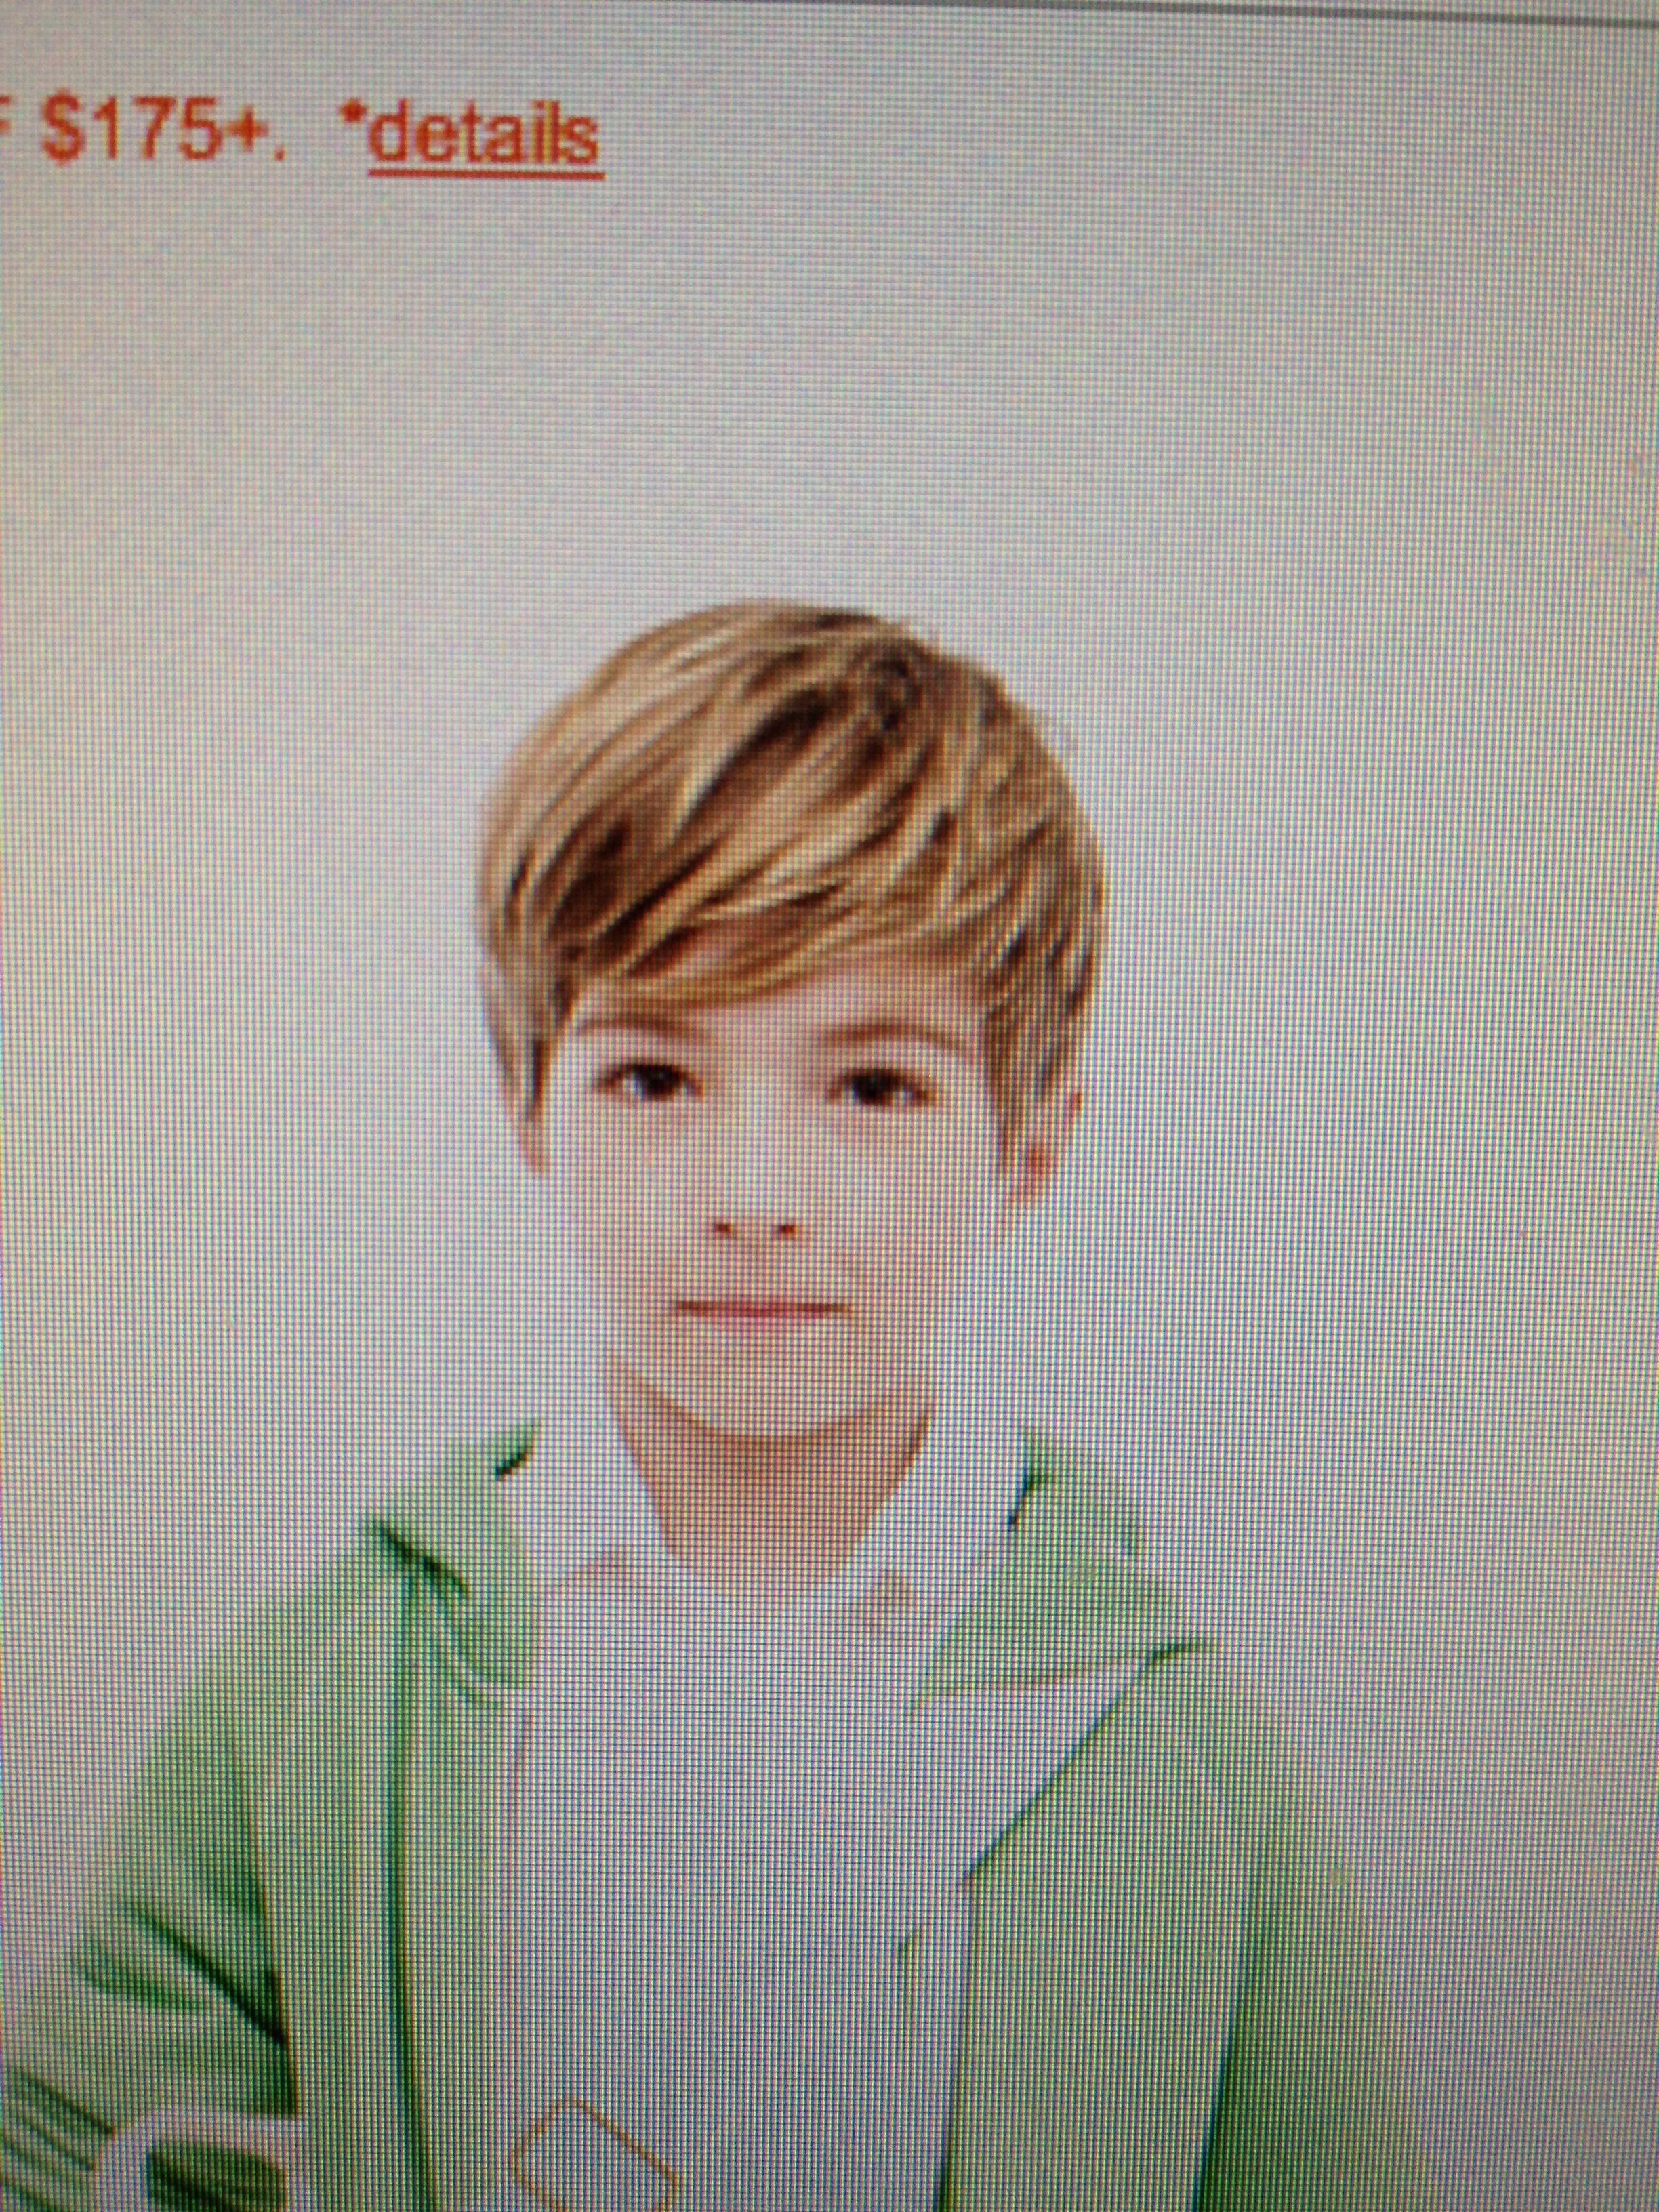 am I crazy that I love this kid s haircut